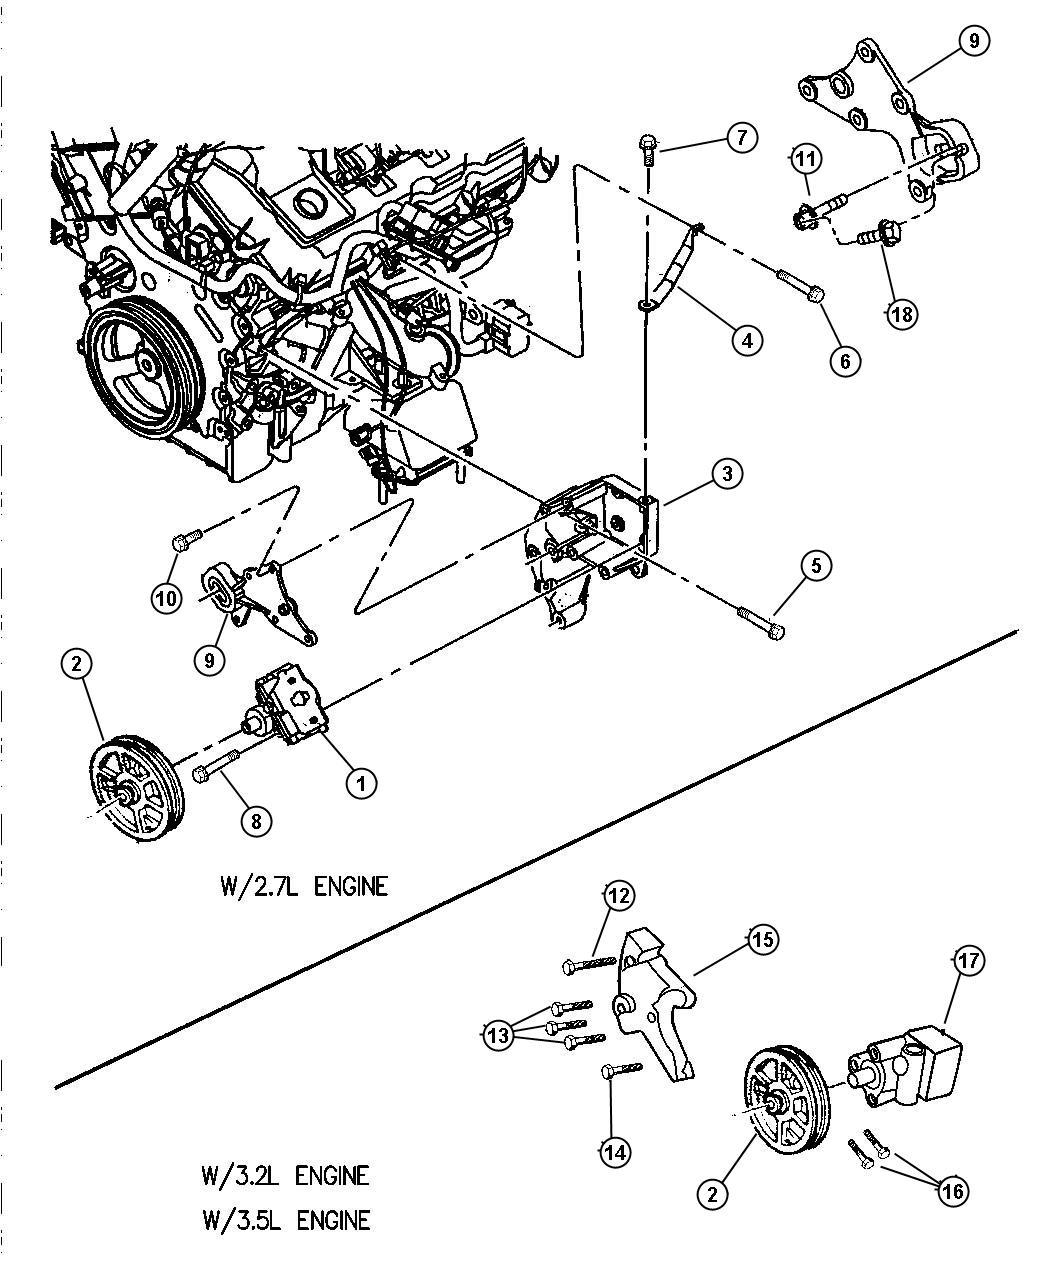 1997 dodge intrepid engine diagram er visio 2013 database 99 stratus camshaft location get free image about wiring